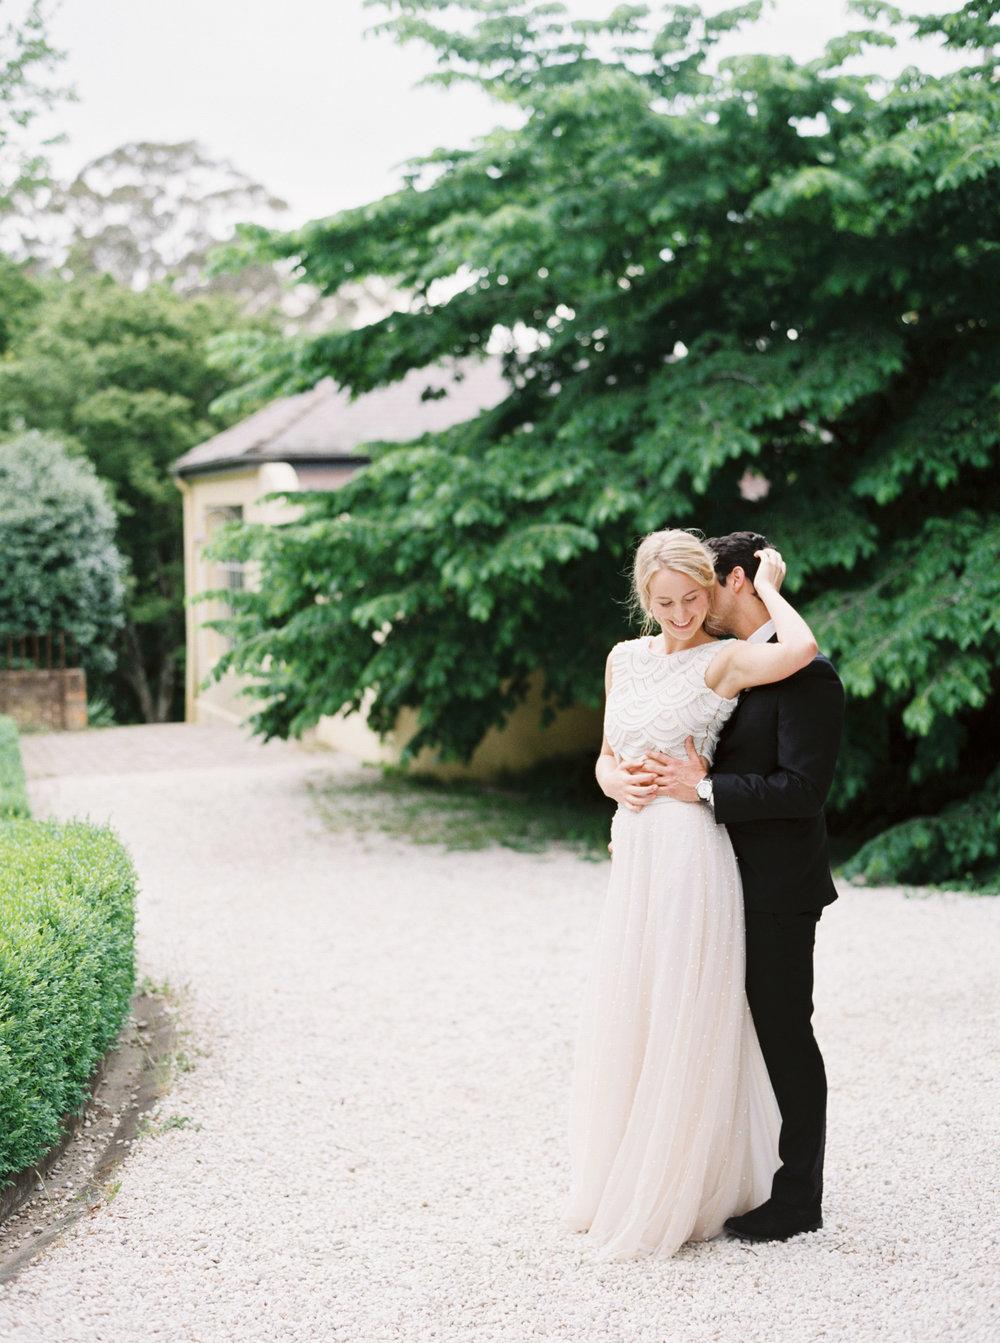 Timeless Southern Highland Wedding Elopement in Bowral NSW Fine Art Film Photographer Sheri McMahon-37.jpg